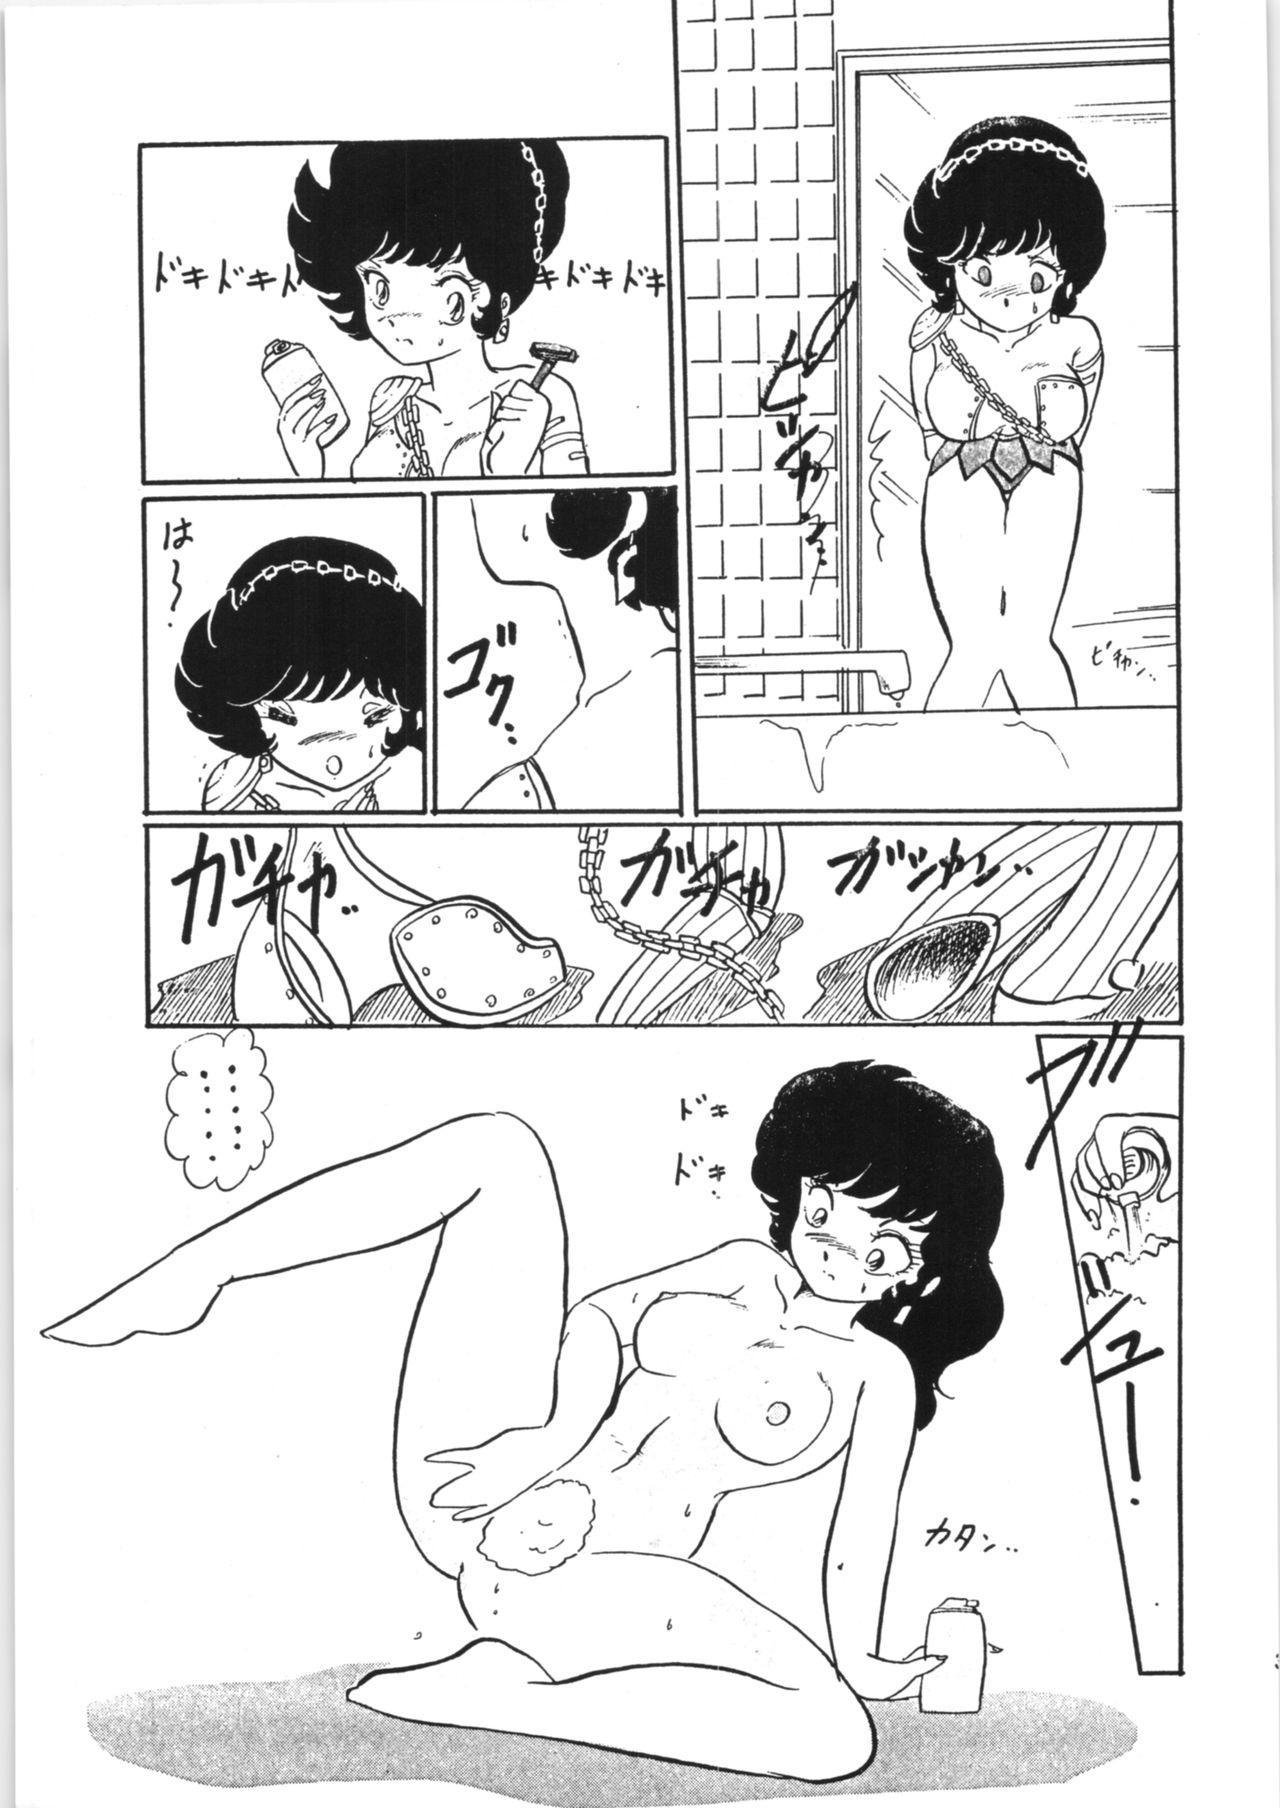 Ranma no Manma 3 29